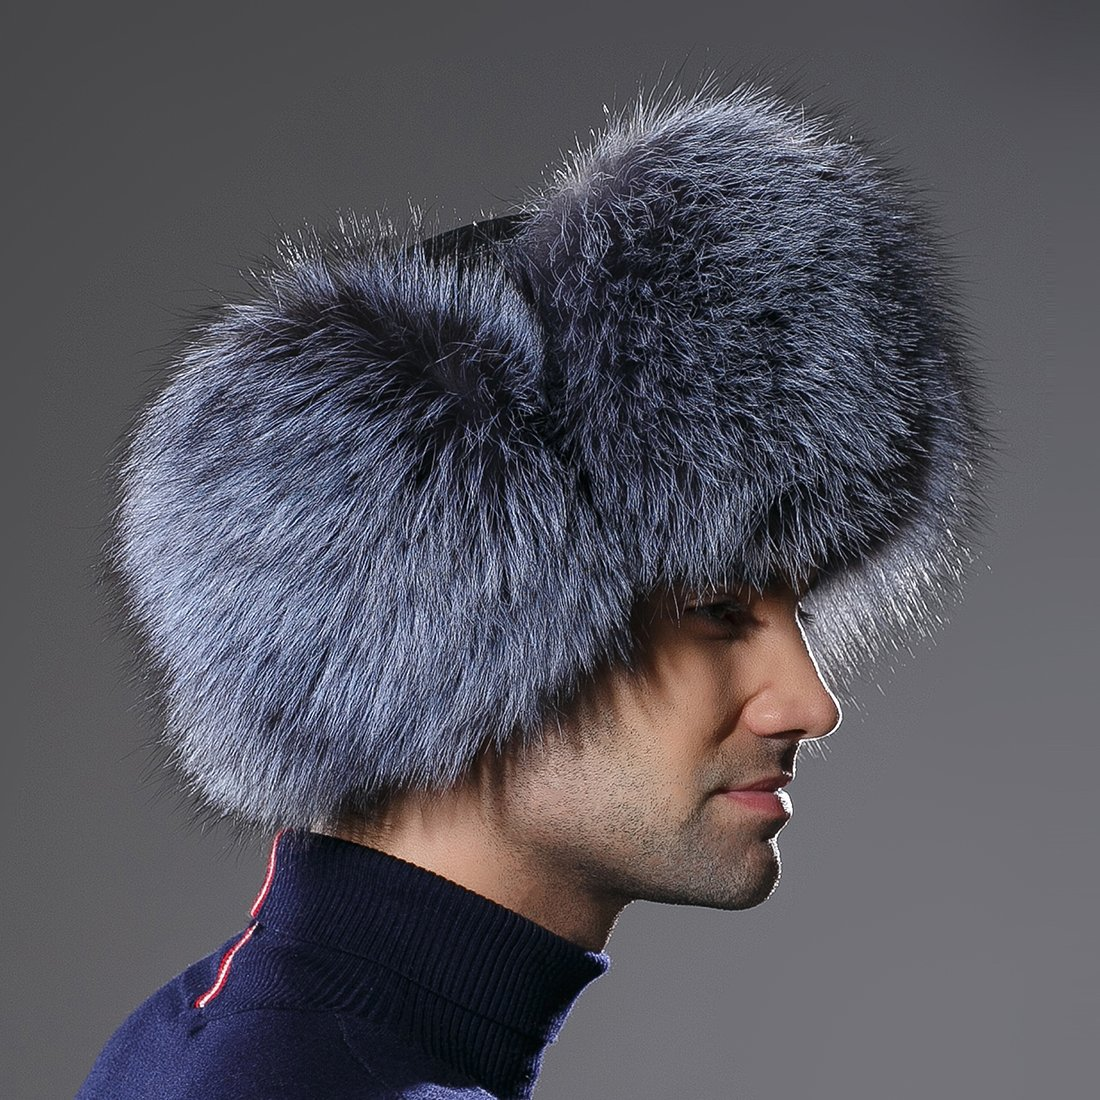 URSFUR Winter Mens Trapper Hat Real Leather Silver Fox Fur Russian Ushanka Cap by URSFUR (Image #3)